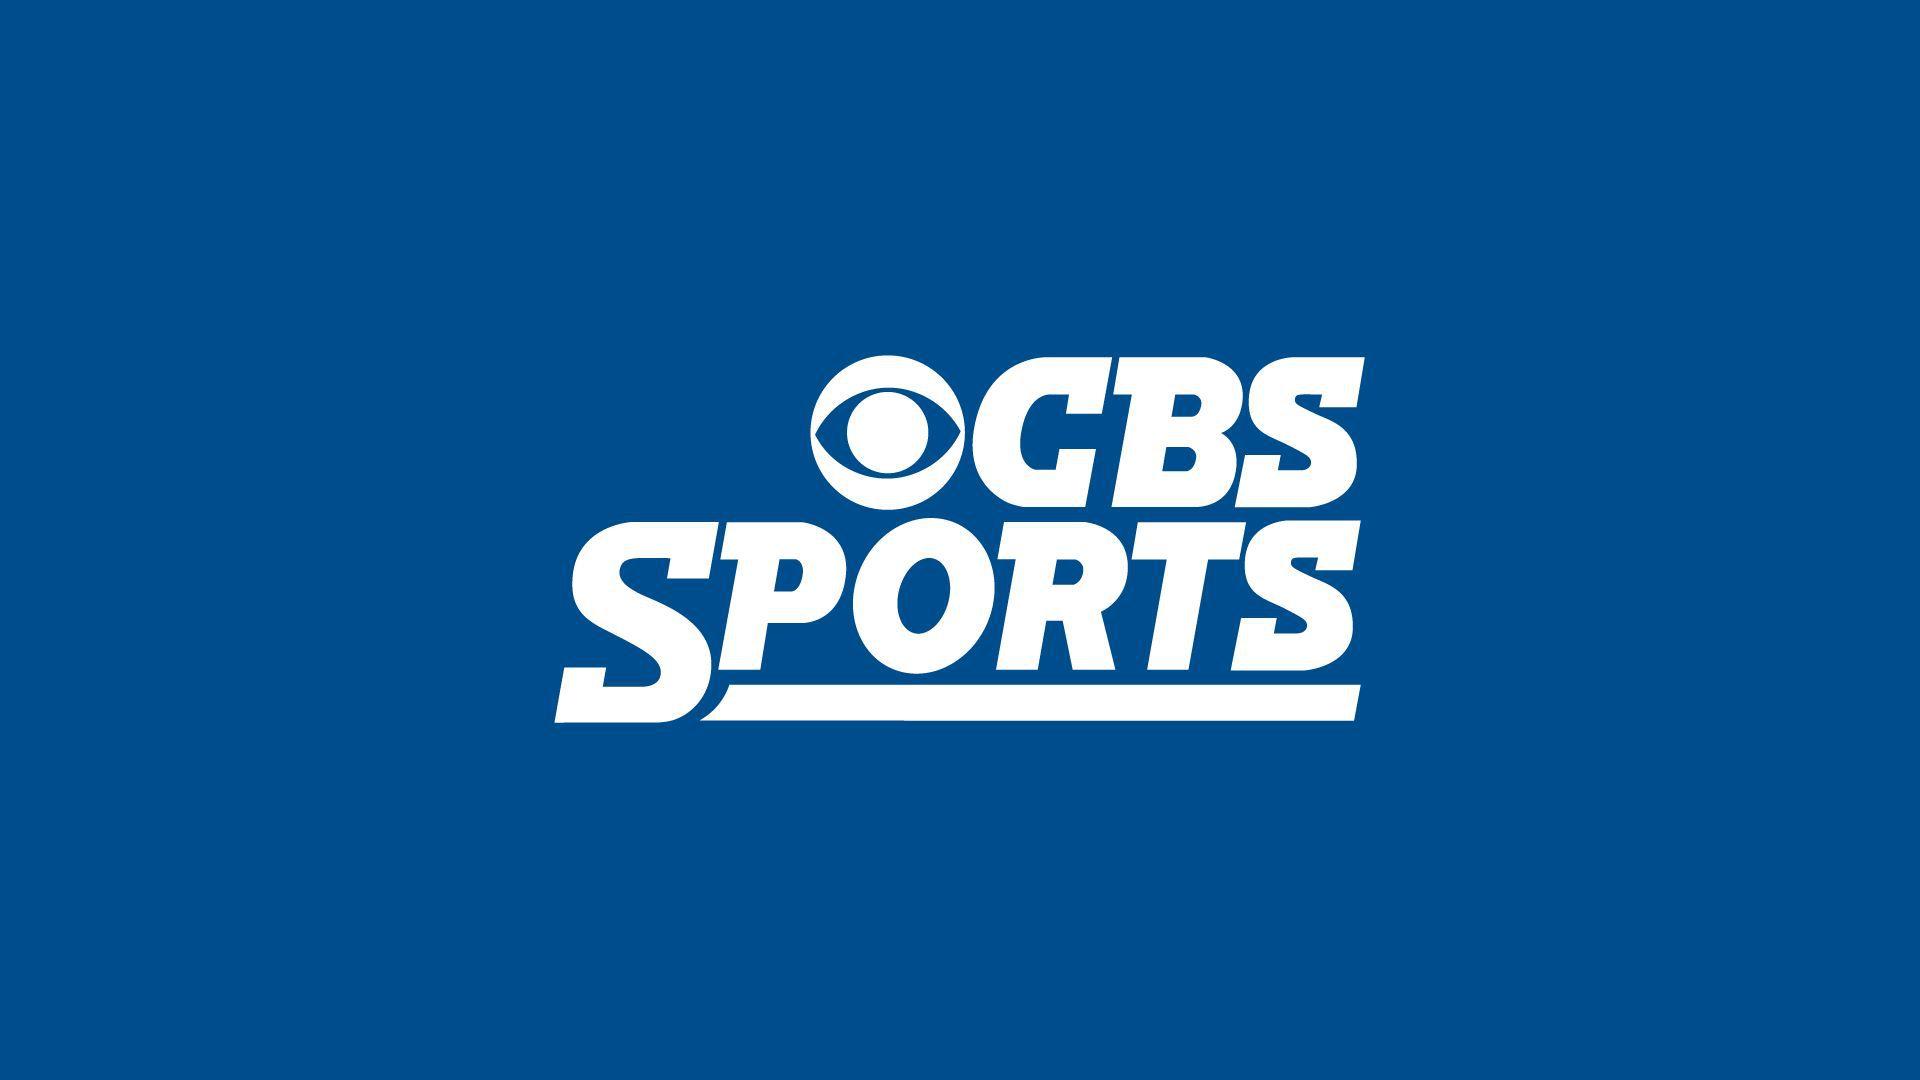 The CBS Sports logo